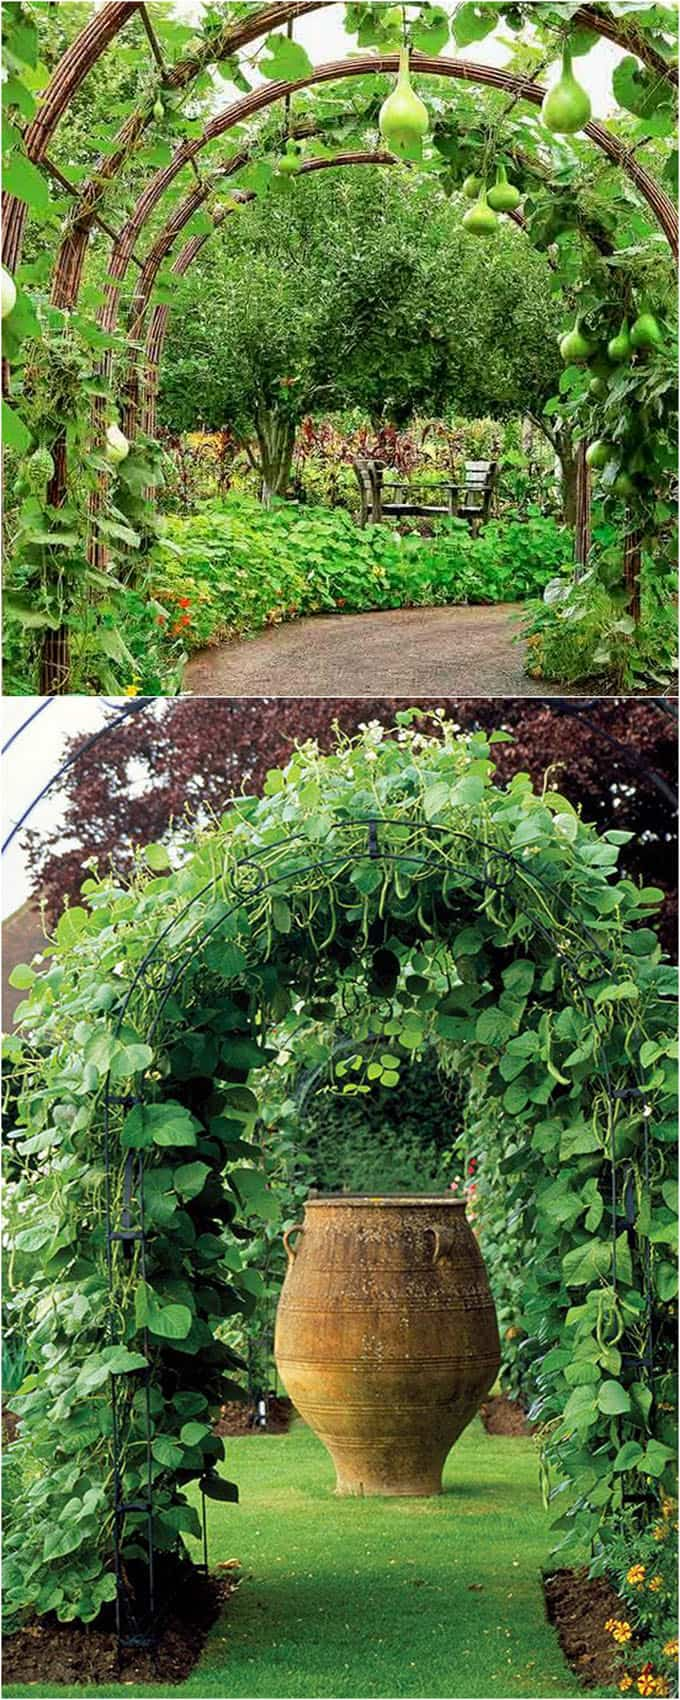 Fullsize Of Vertical Garden Trellis